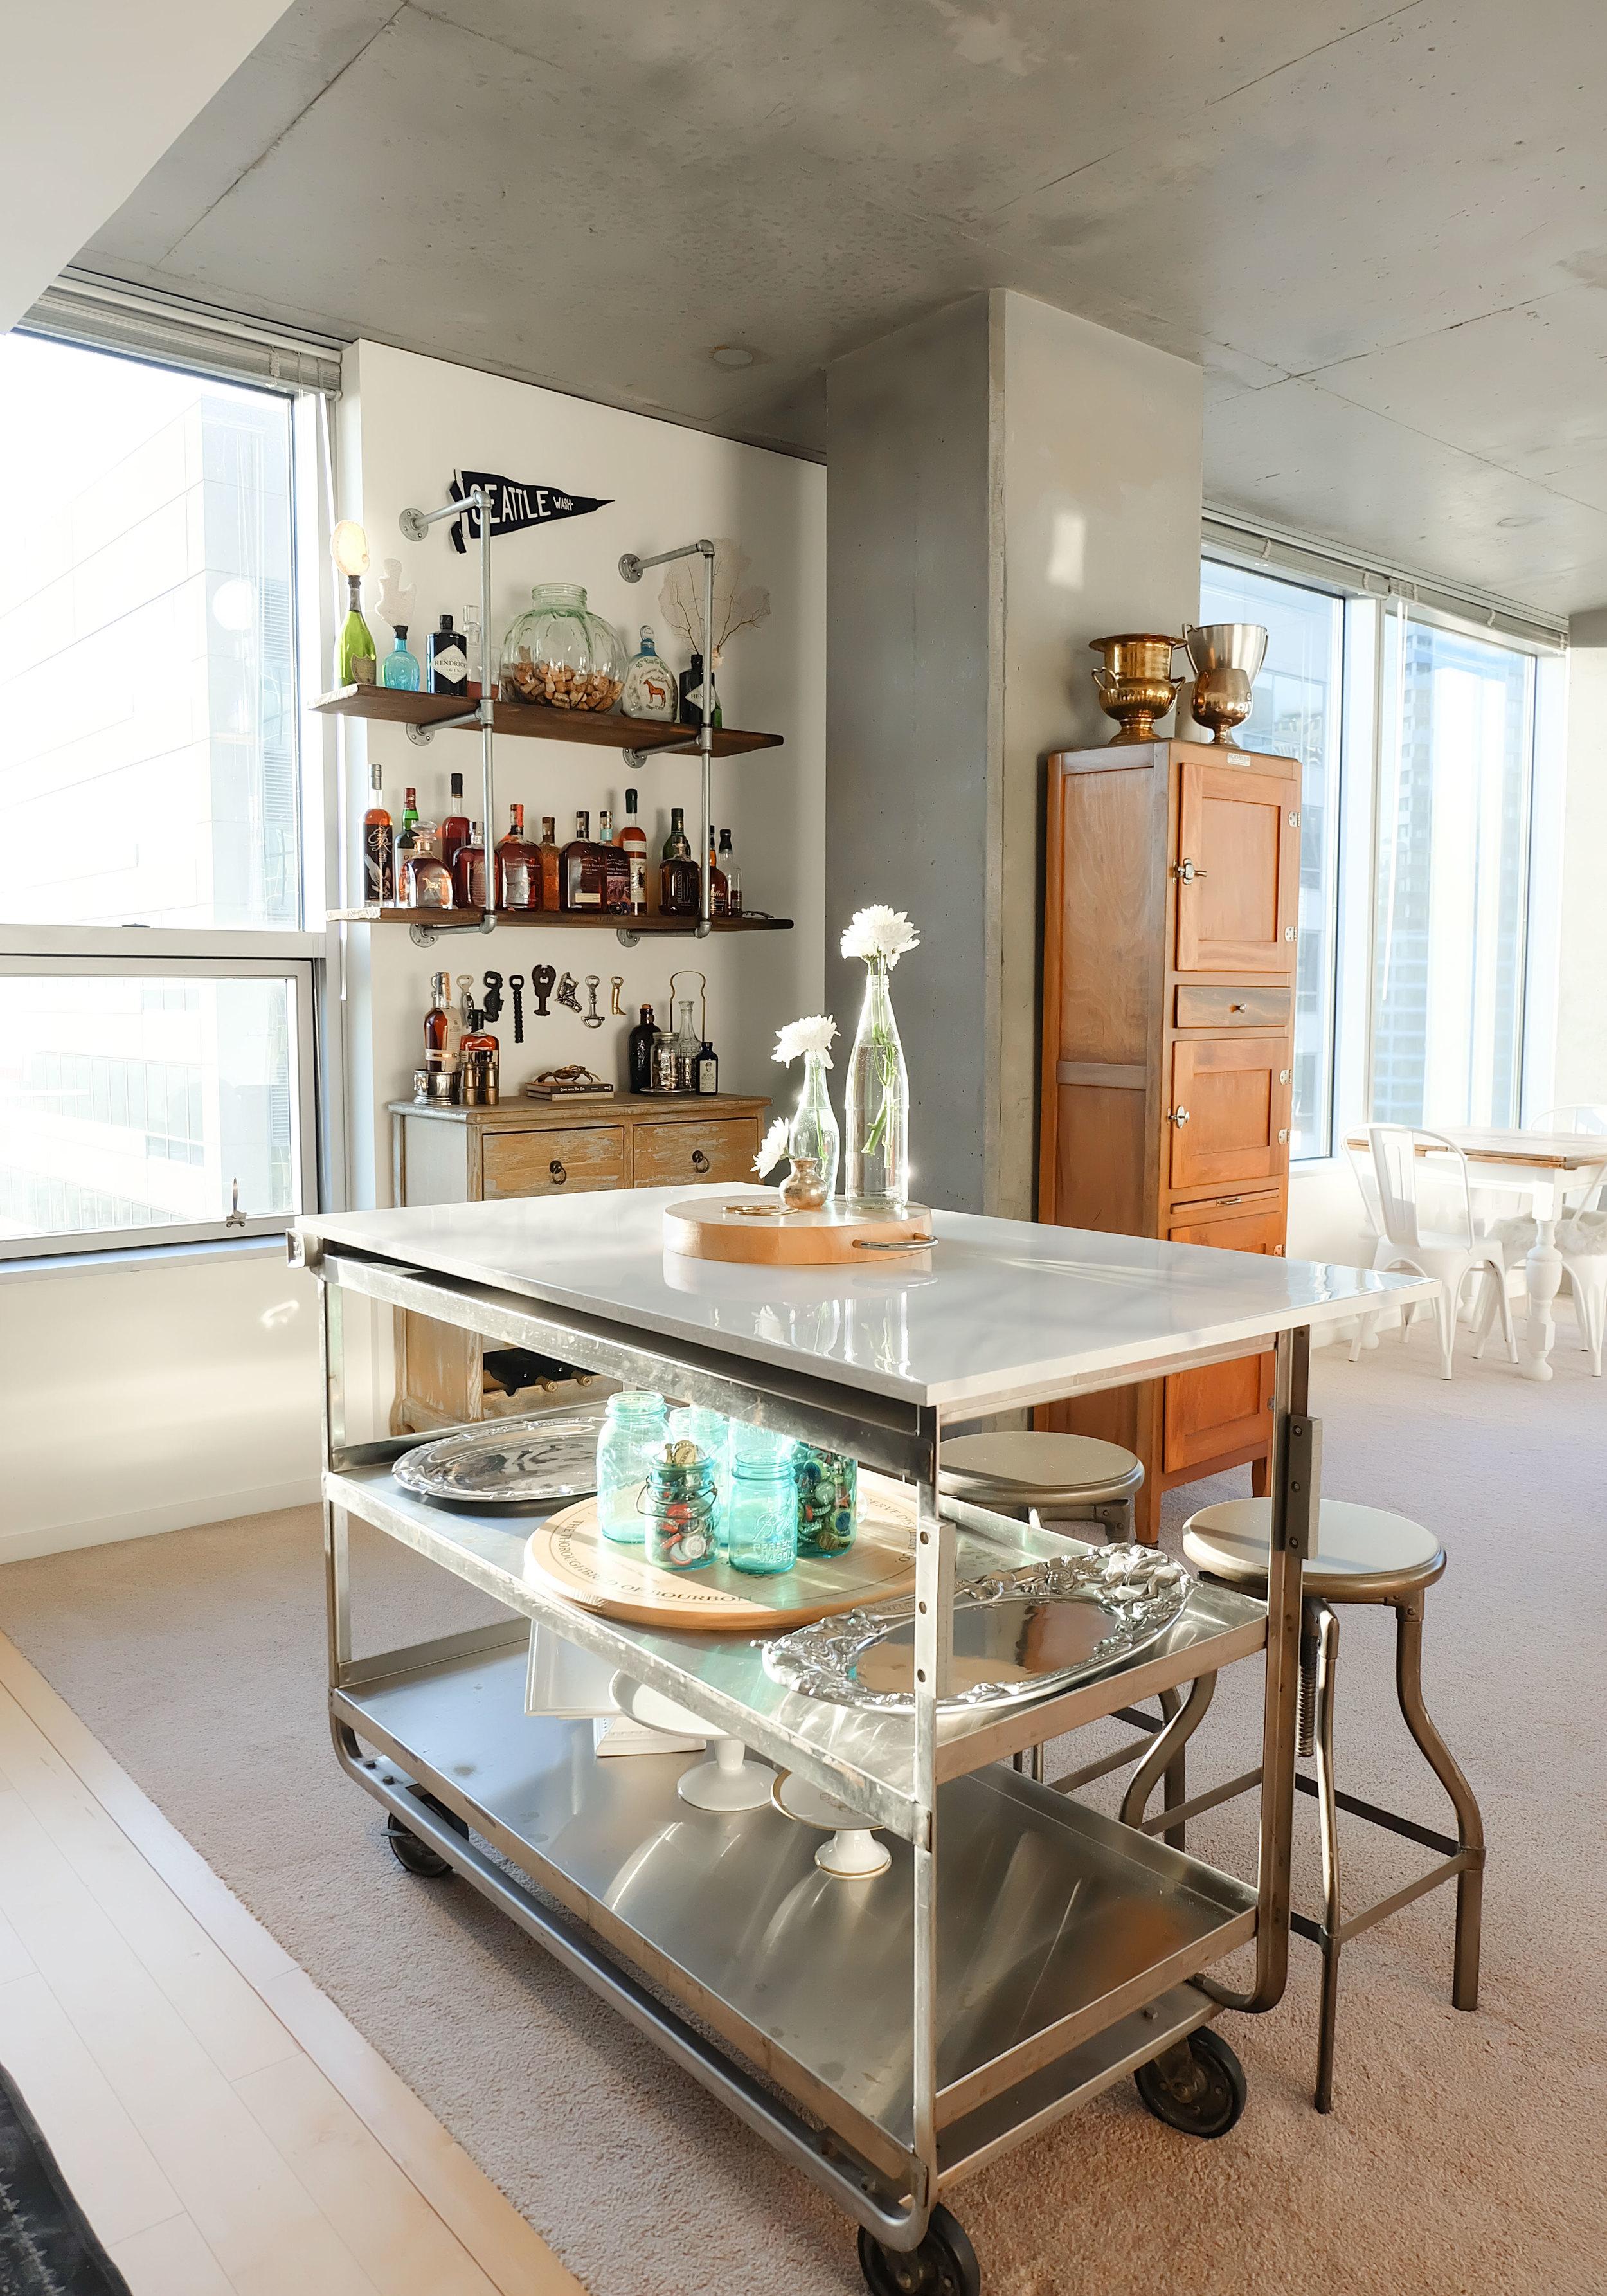 DIY Faux Carrara Marble Countertop, DIY Kitchen Island Cart, Industrial Loft in Seattle, DIY Bar